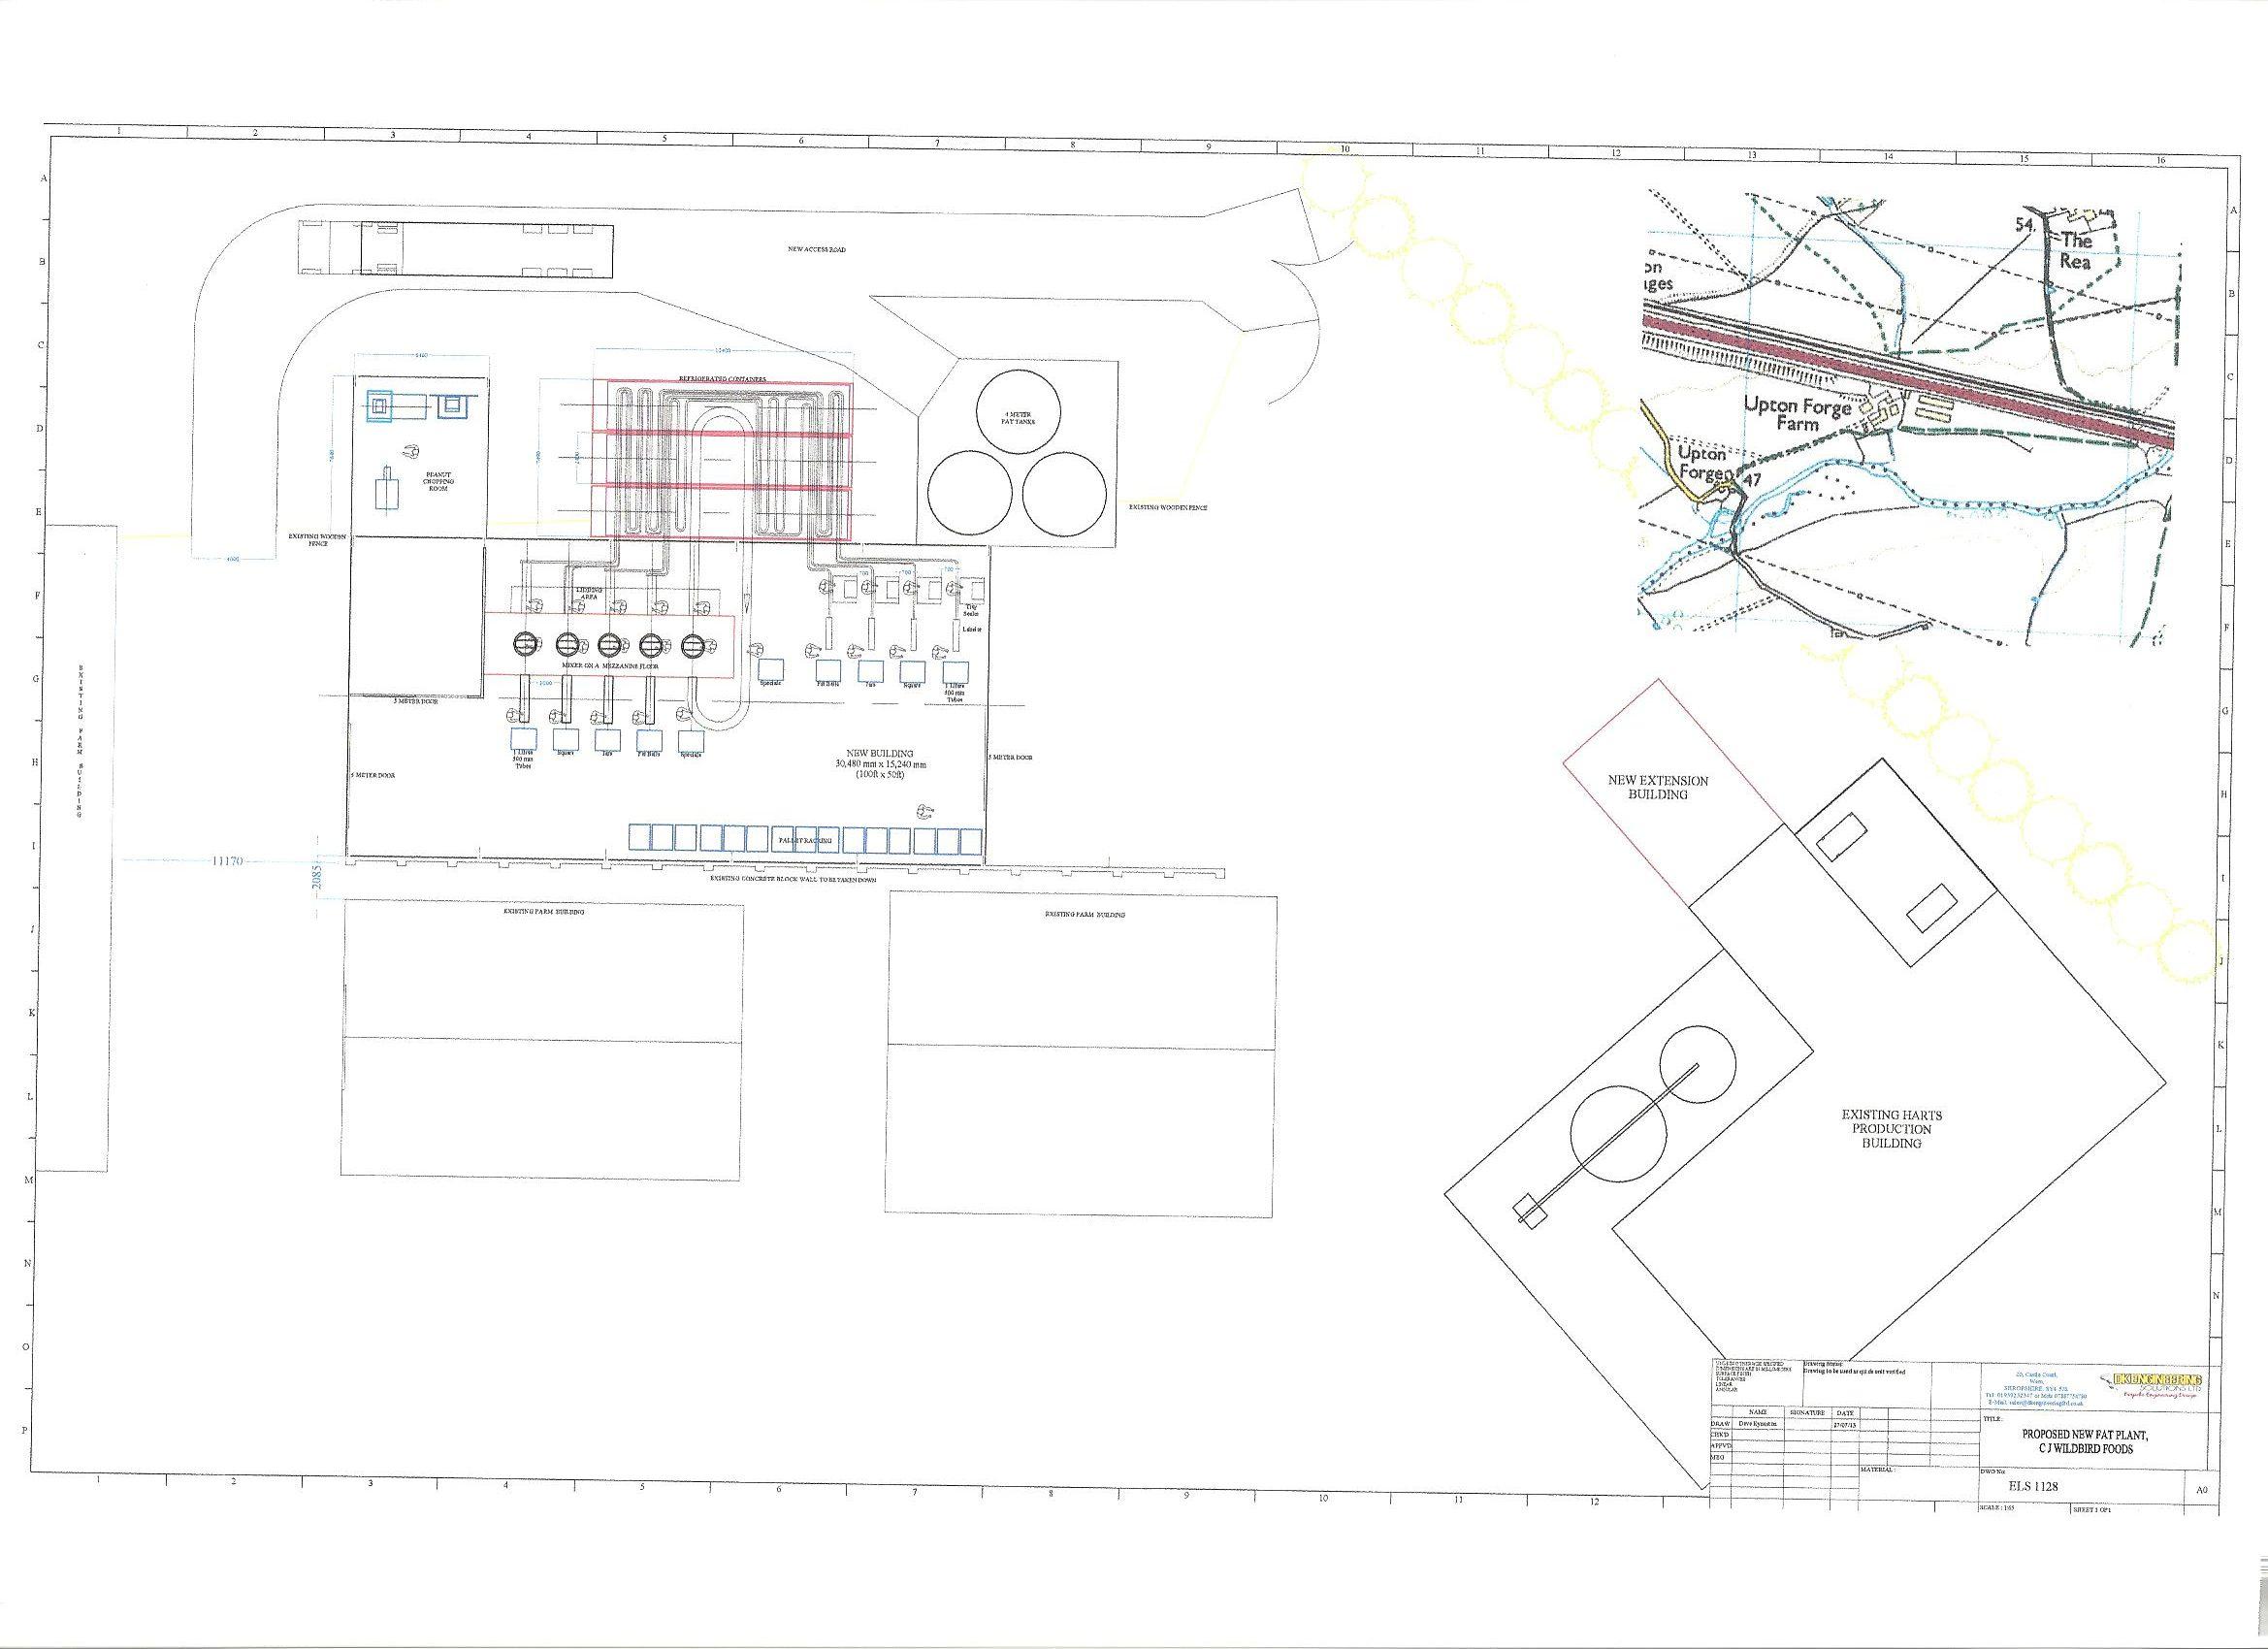 Samsung Dmt800rhs Wiring Diagram Samsung Parts Diagram Www